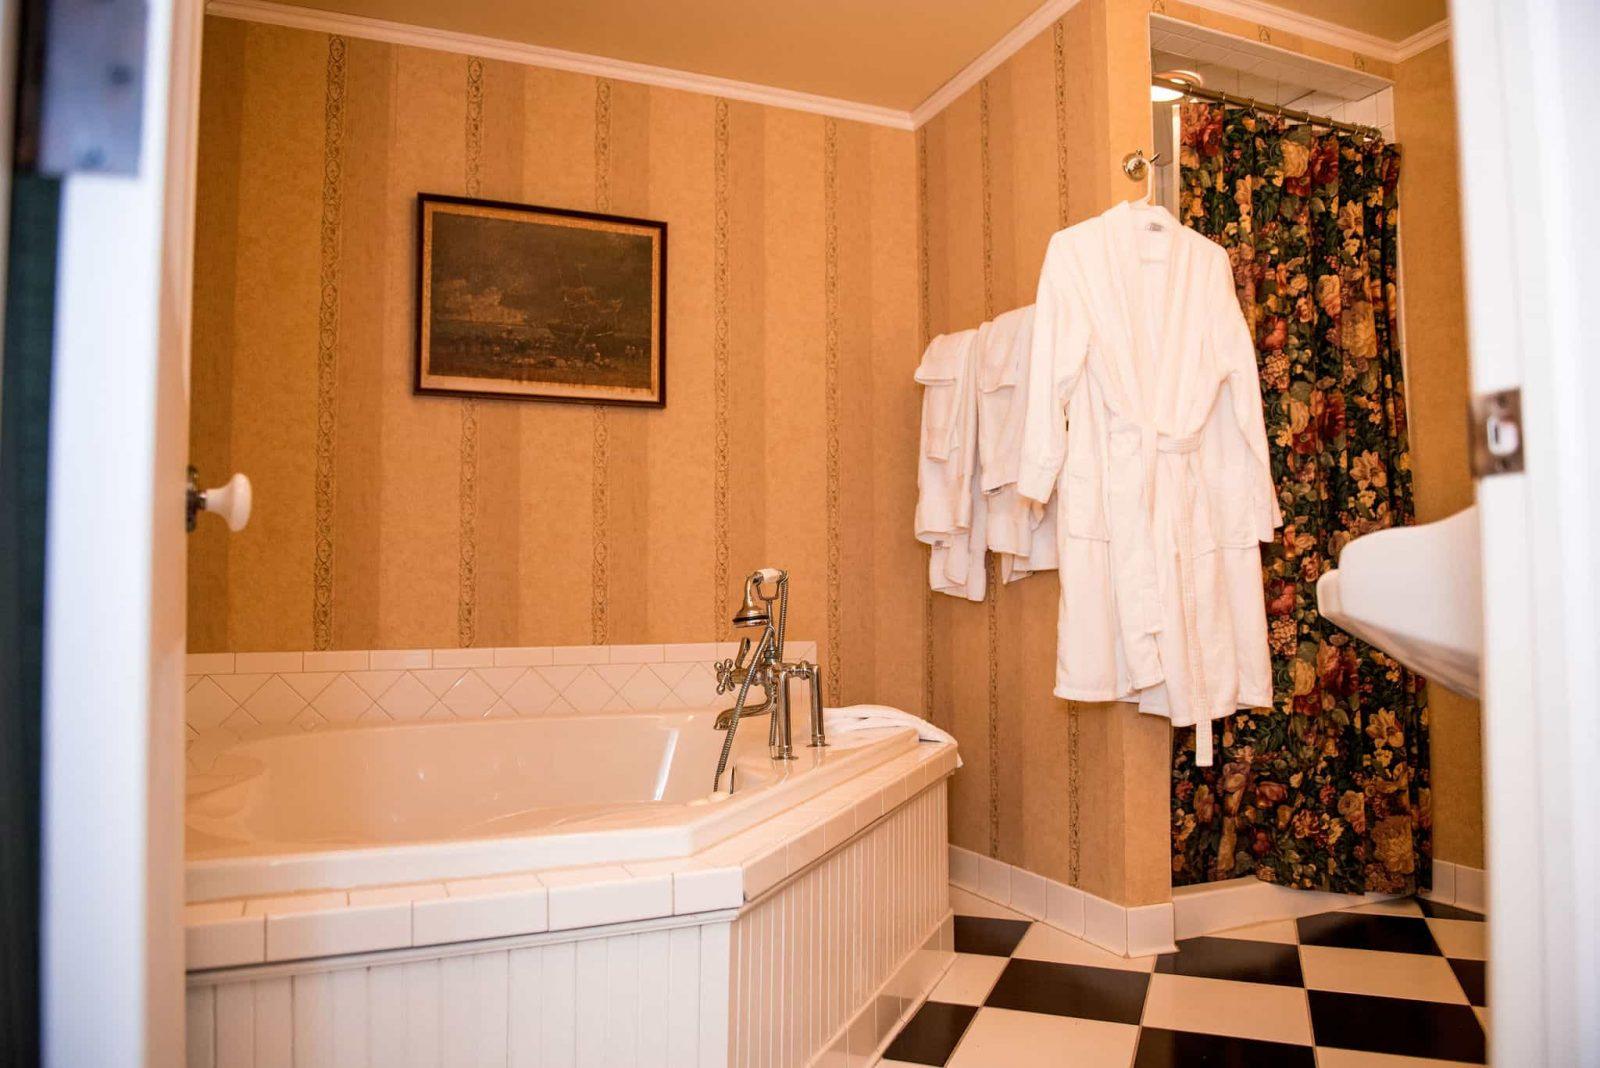 Room 31 bathroom interior facing the whirlpool tub